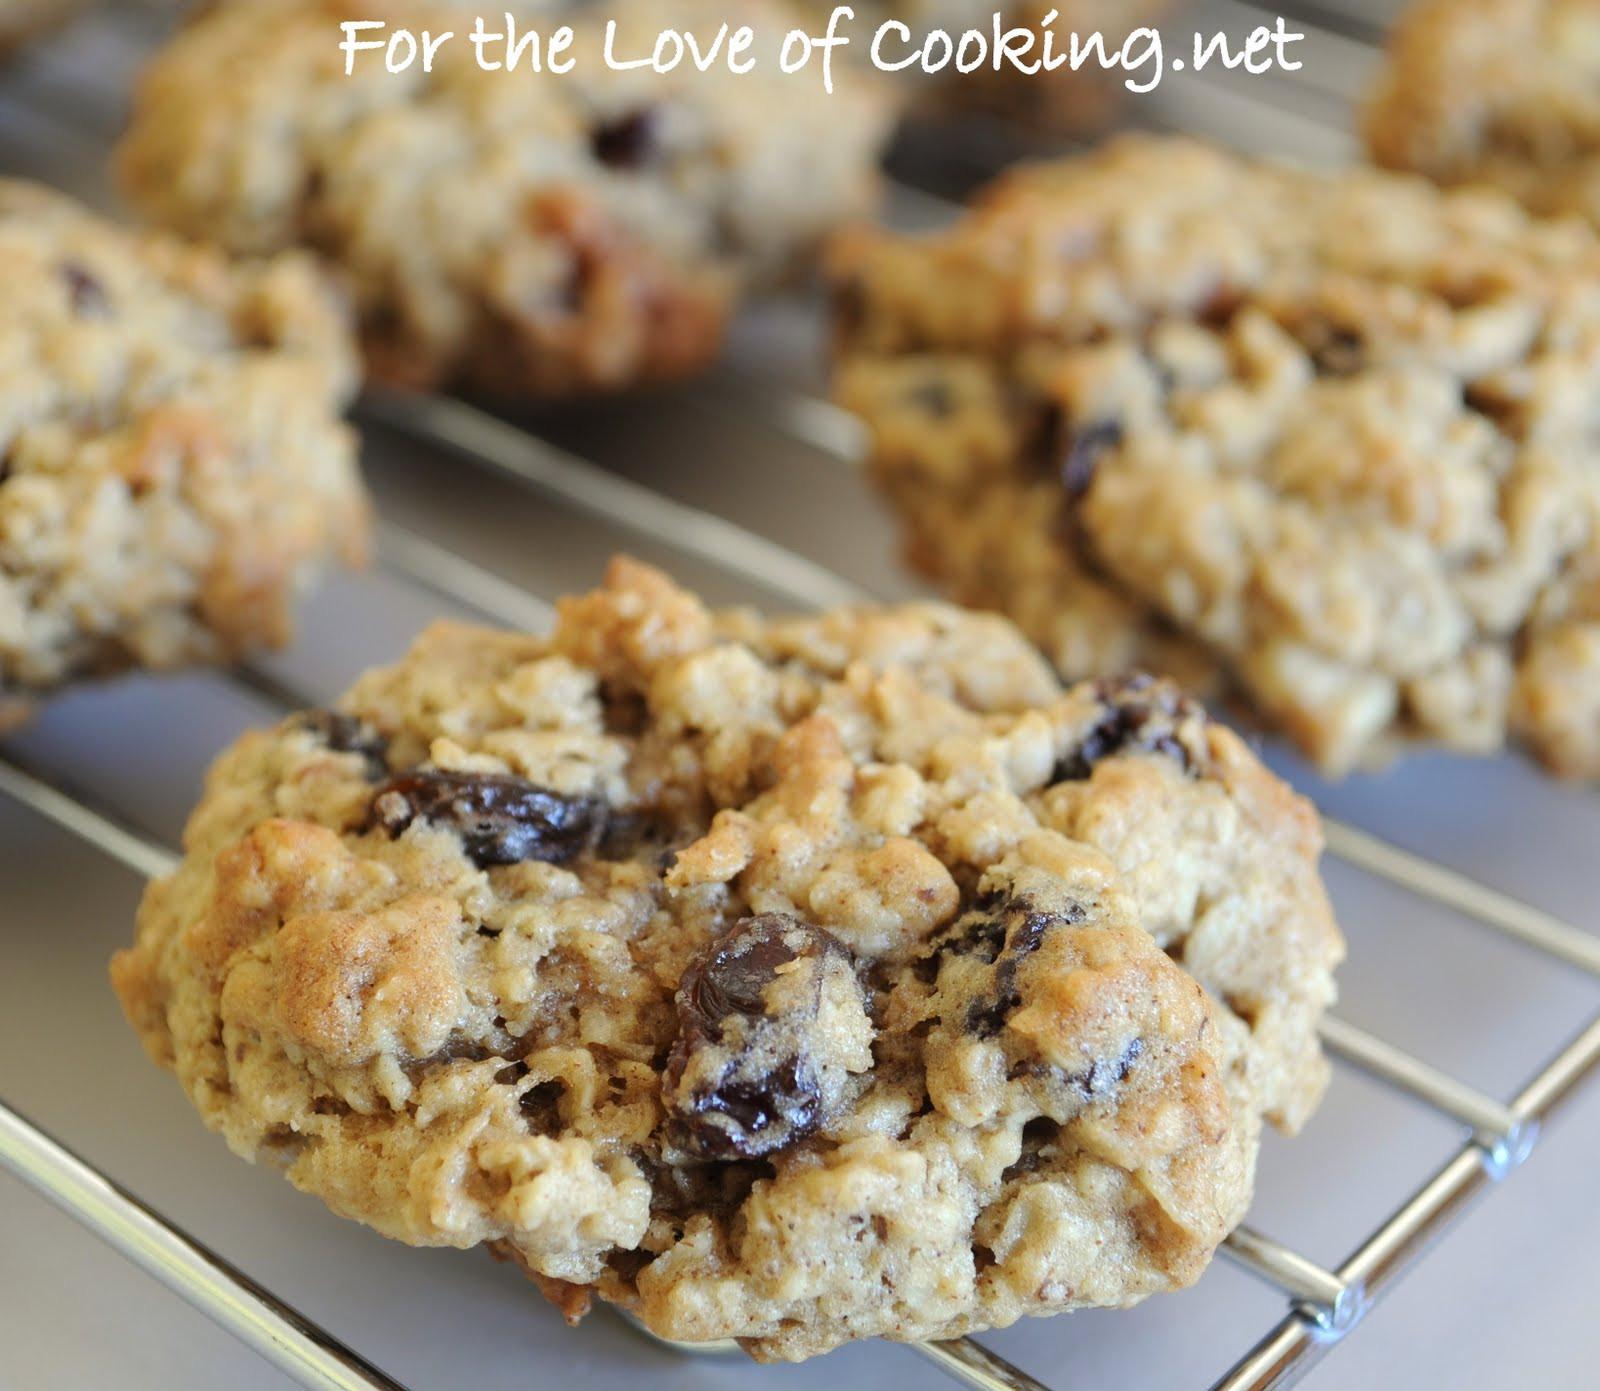 Oatmeal Walnut Cookies  Cinnamon Oatmeal Raisin and Walnut Cookies